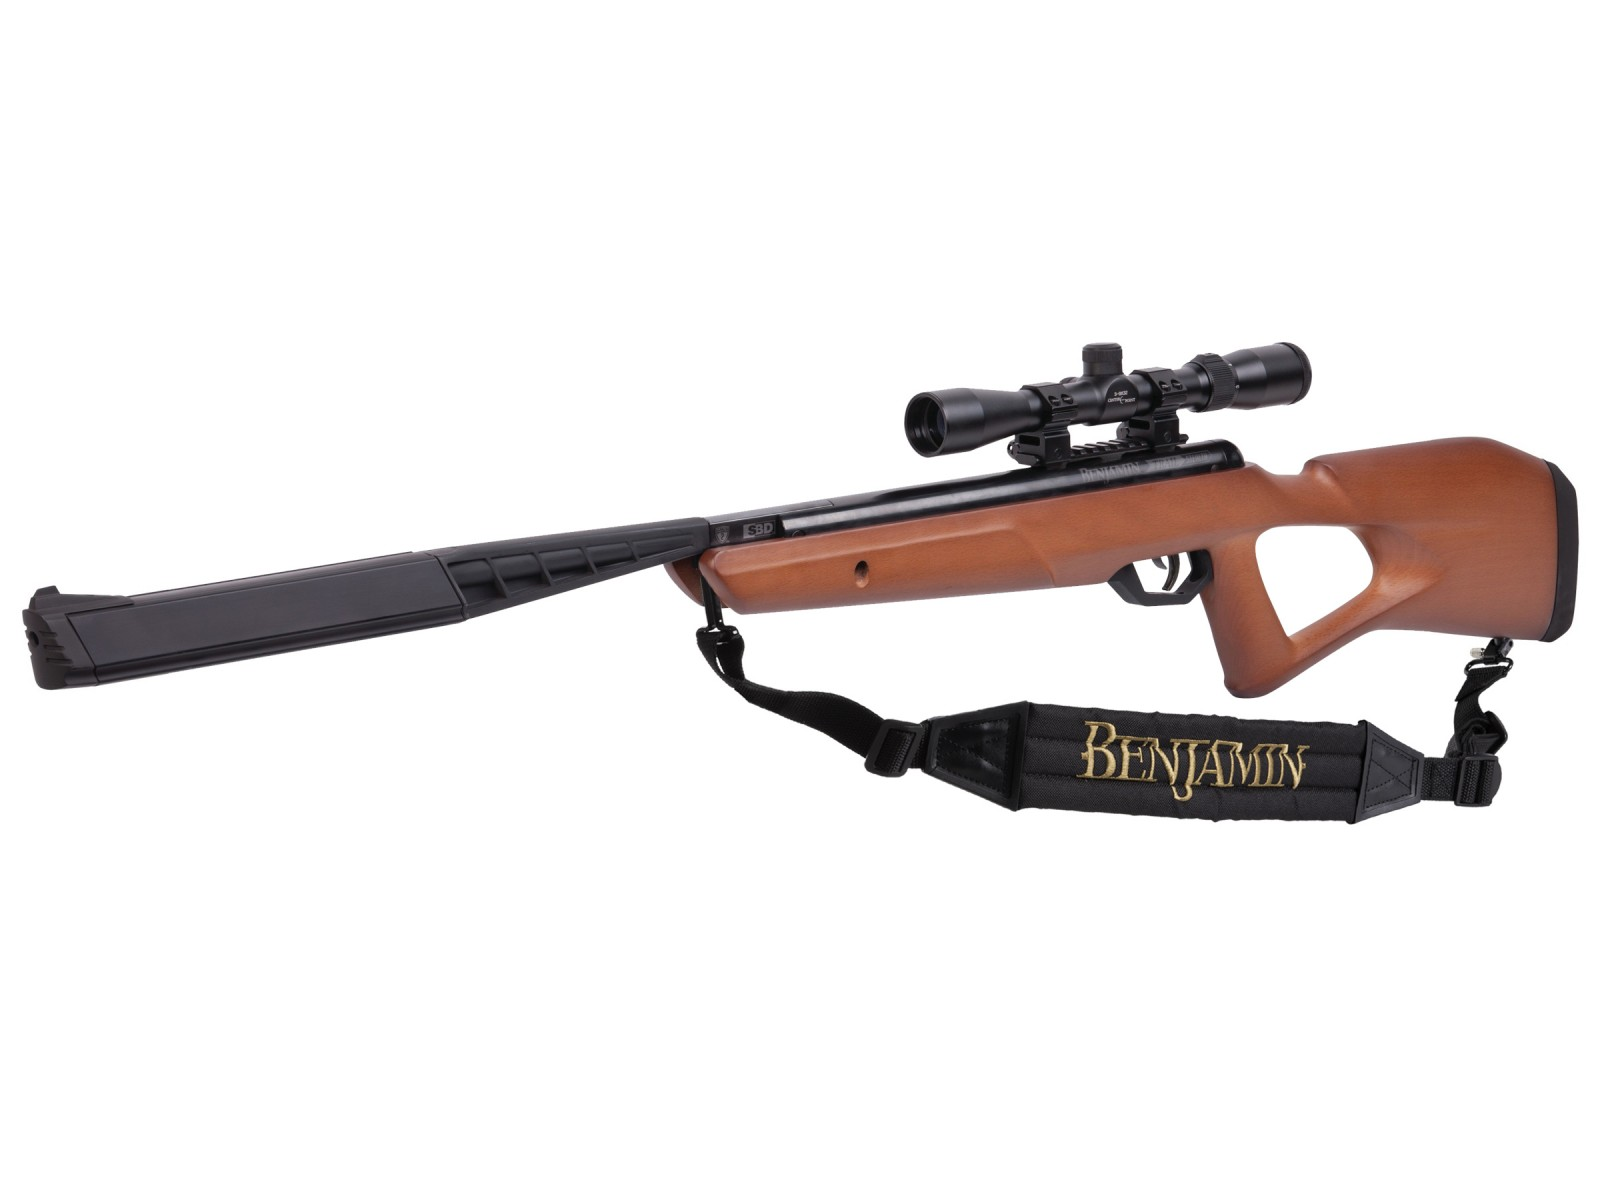 Cheap Benjamin Trail SBD NP2 Air Rifle Combo, Wood Stock 0.22